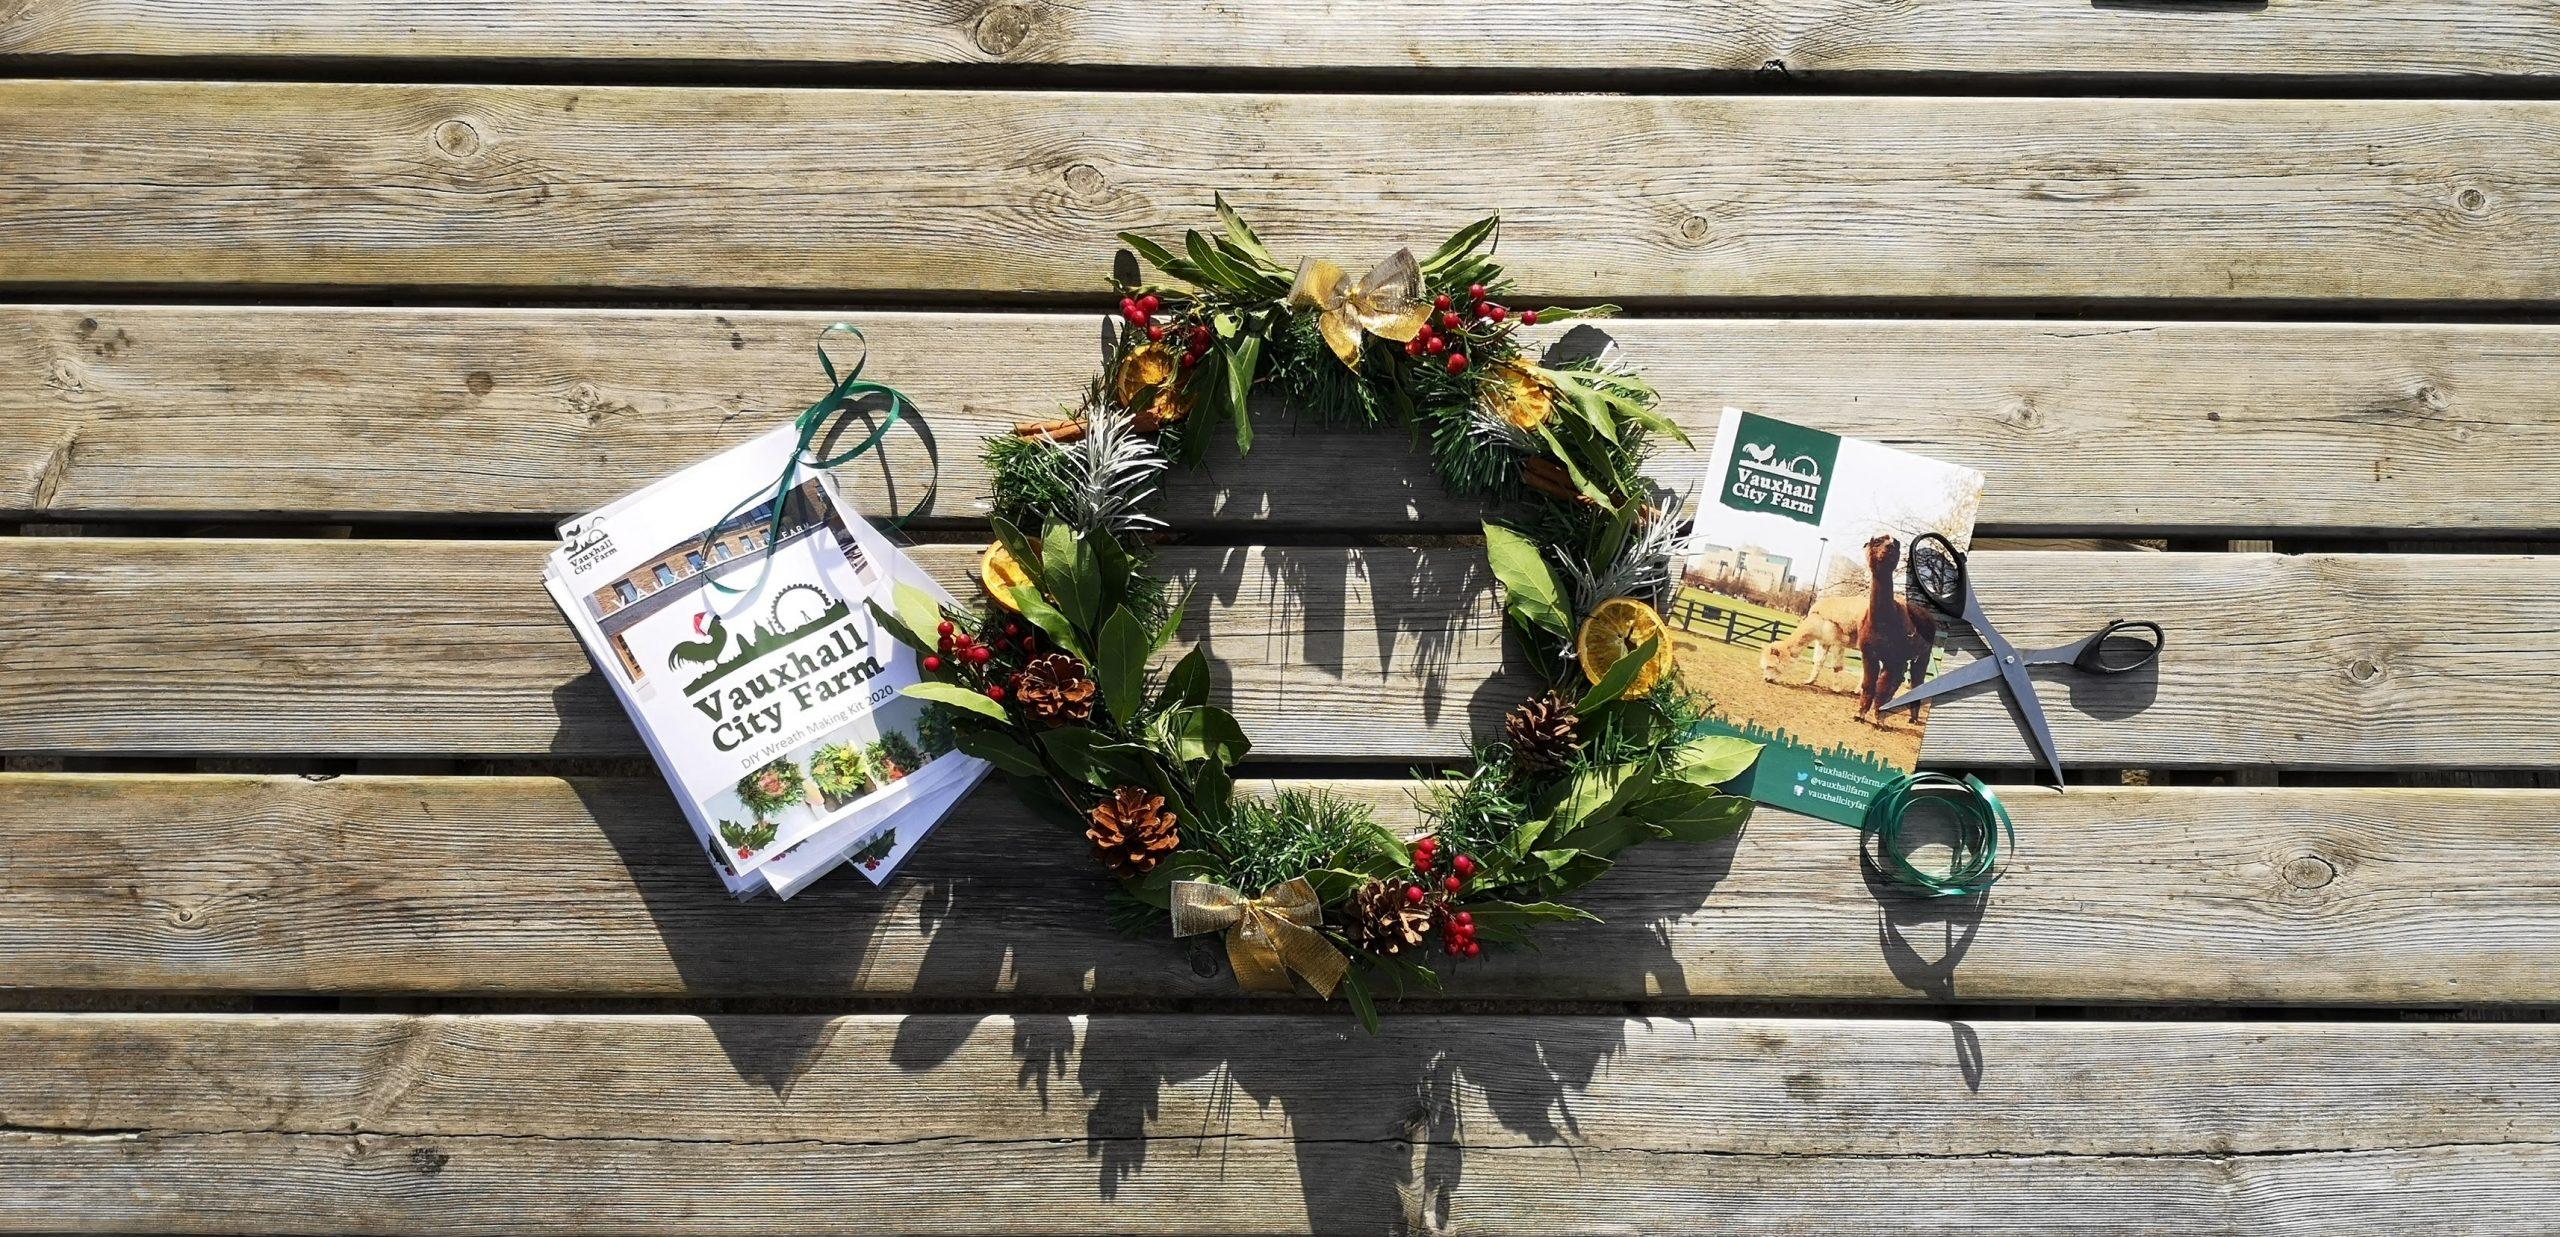 DIY Wreath Making Boxes